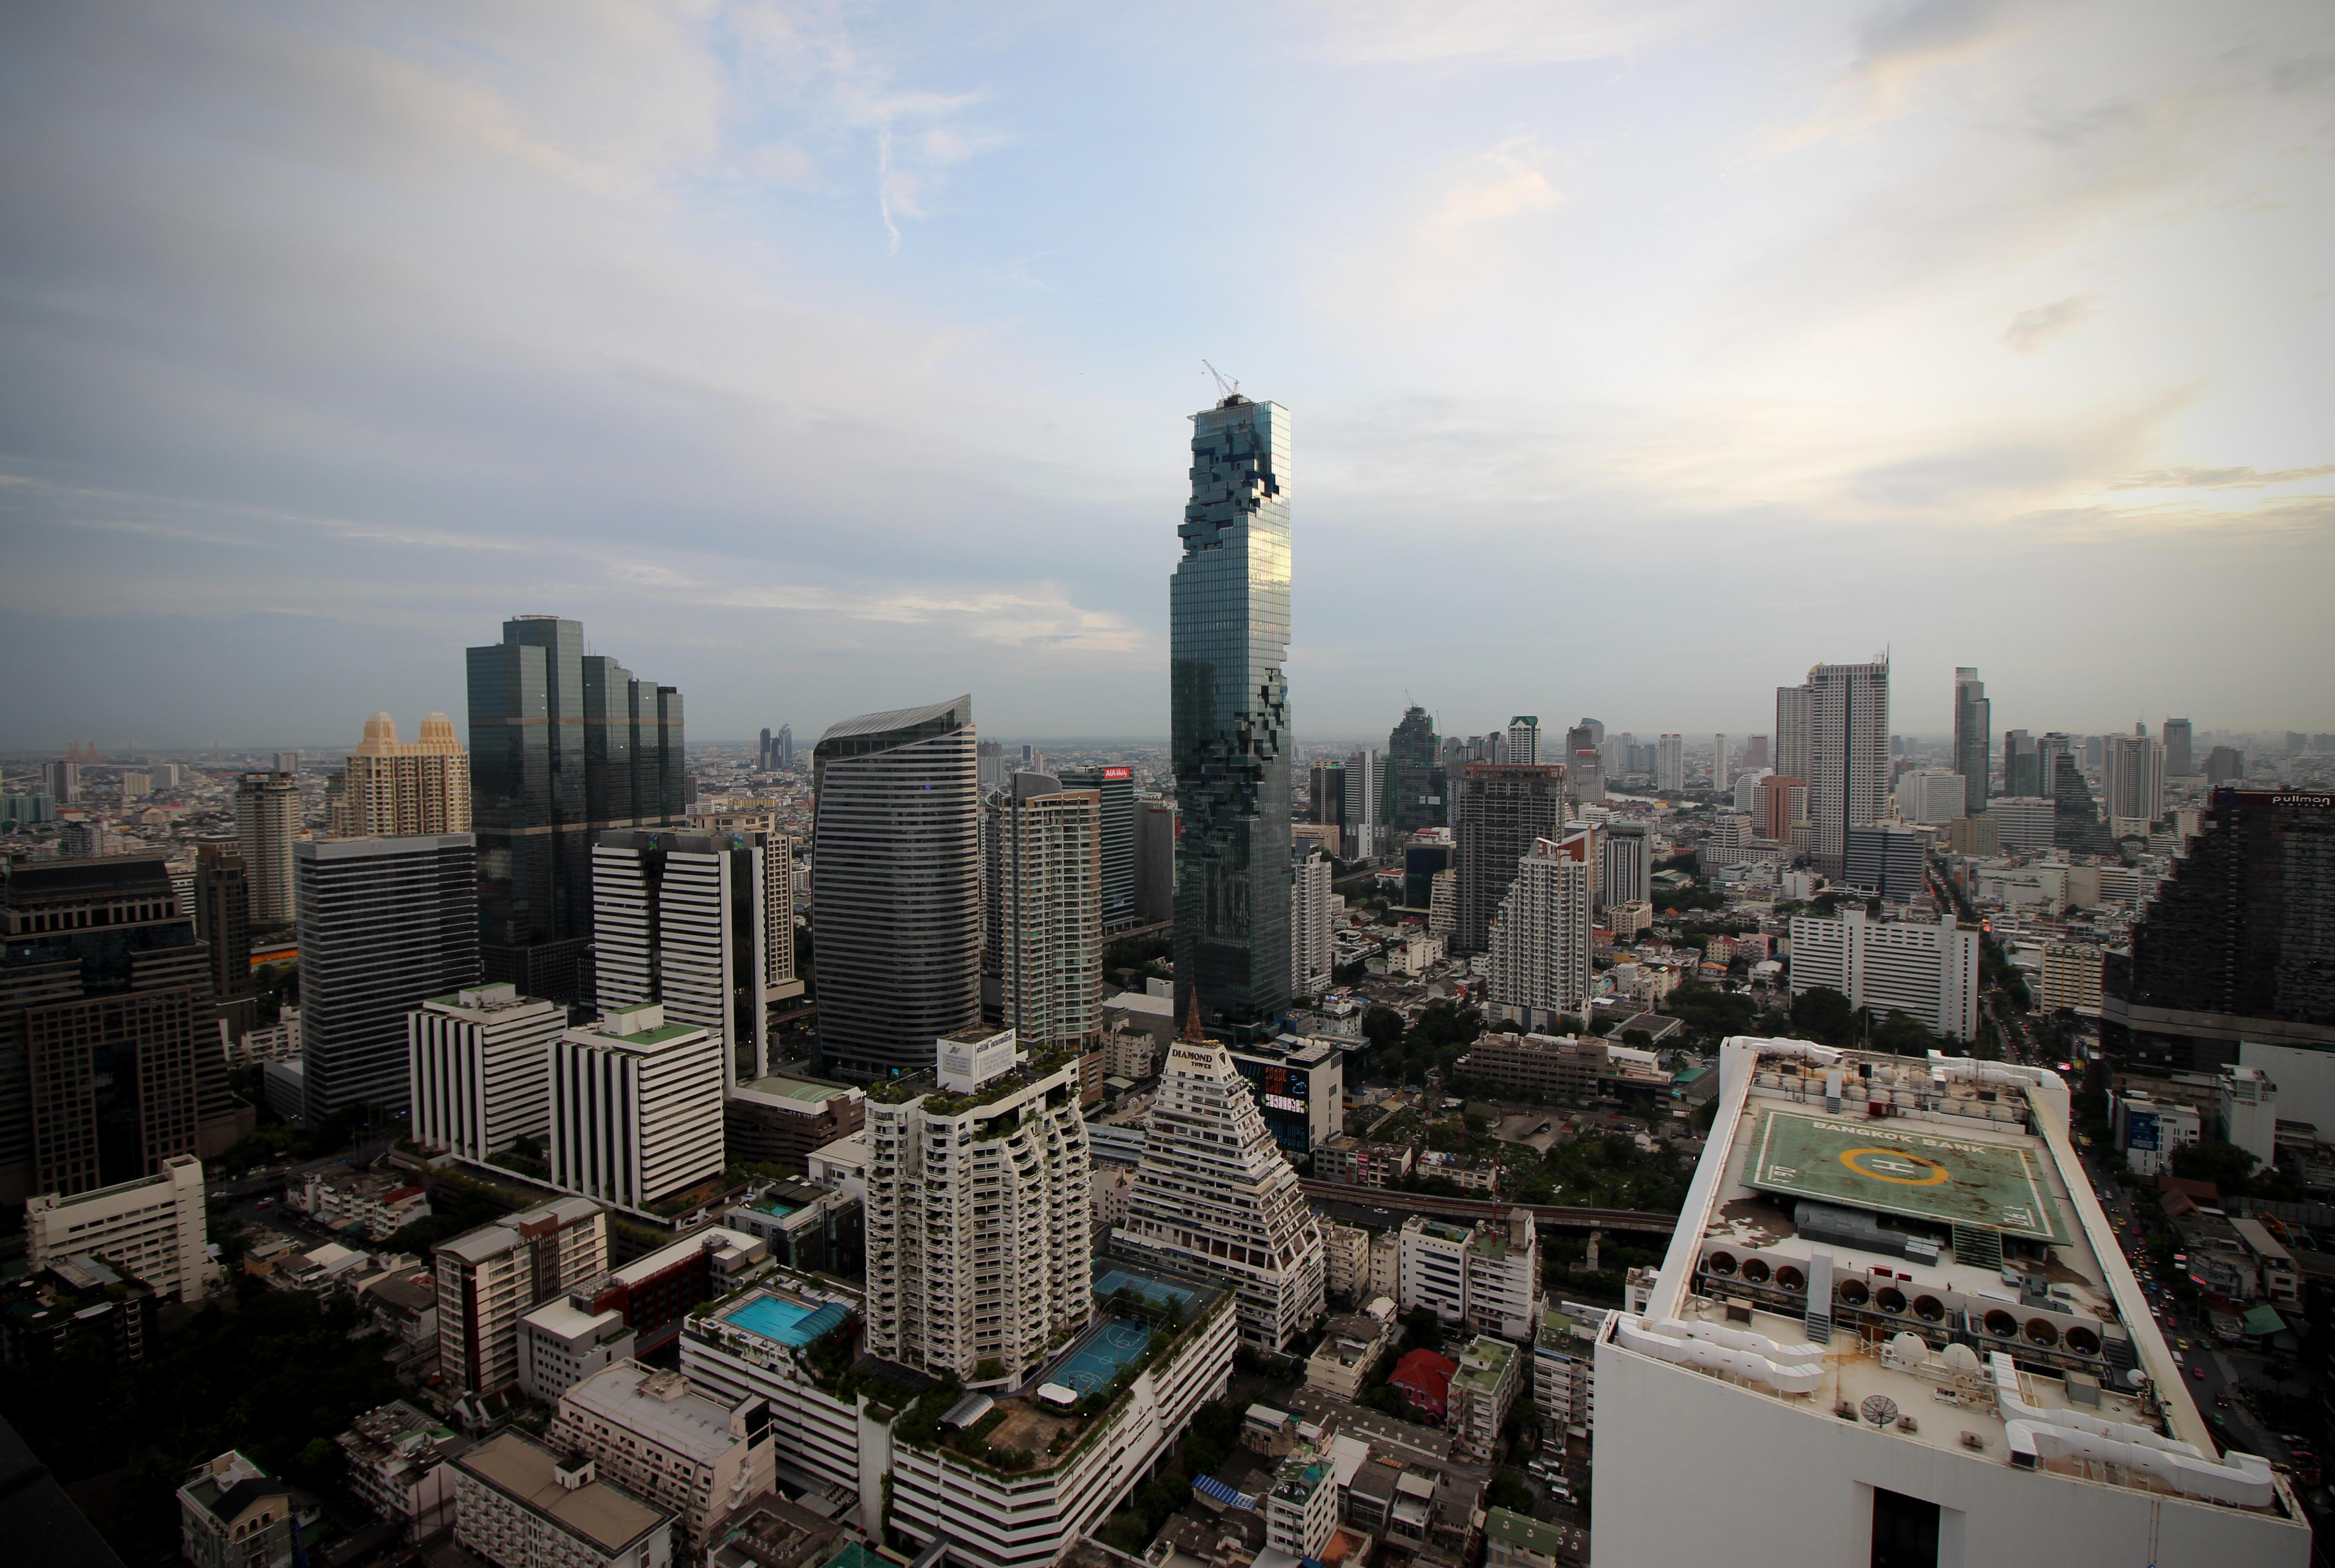 Dissertation help ireland singapore